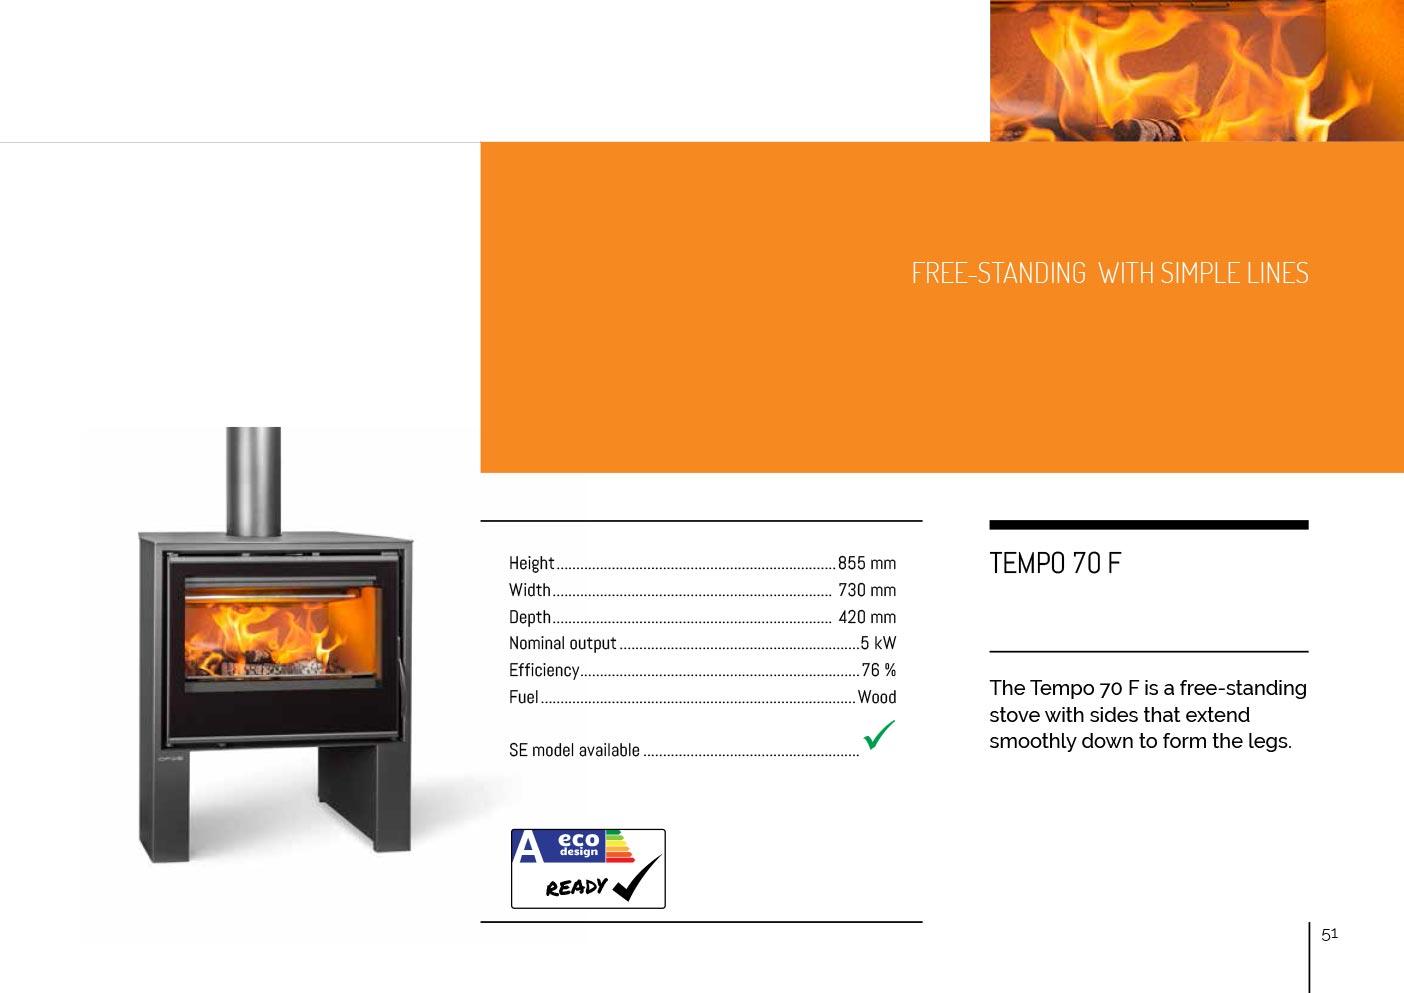 opus-stoves-brochure-(2)-51